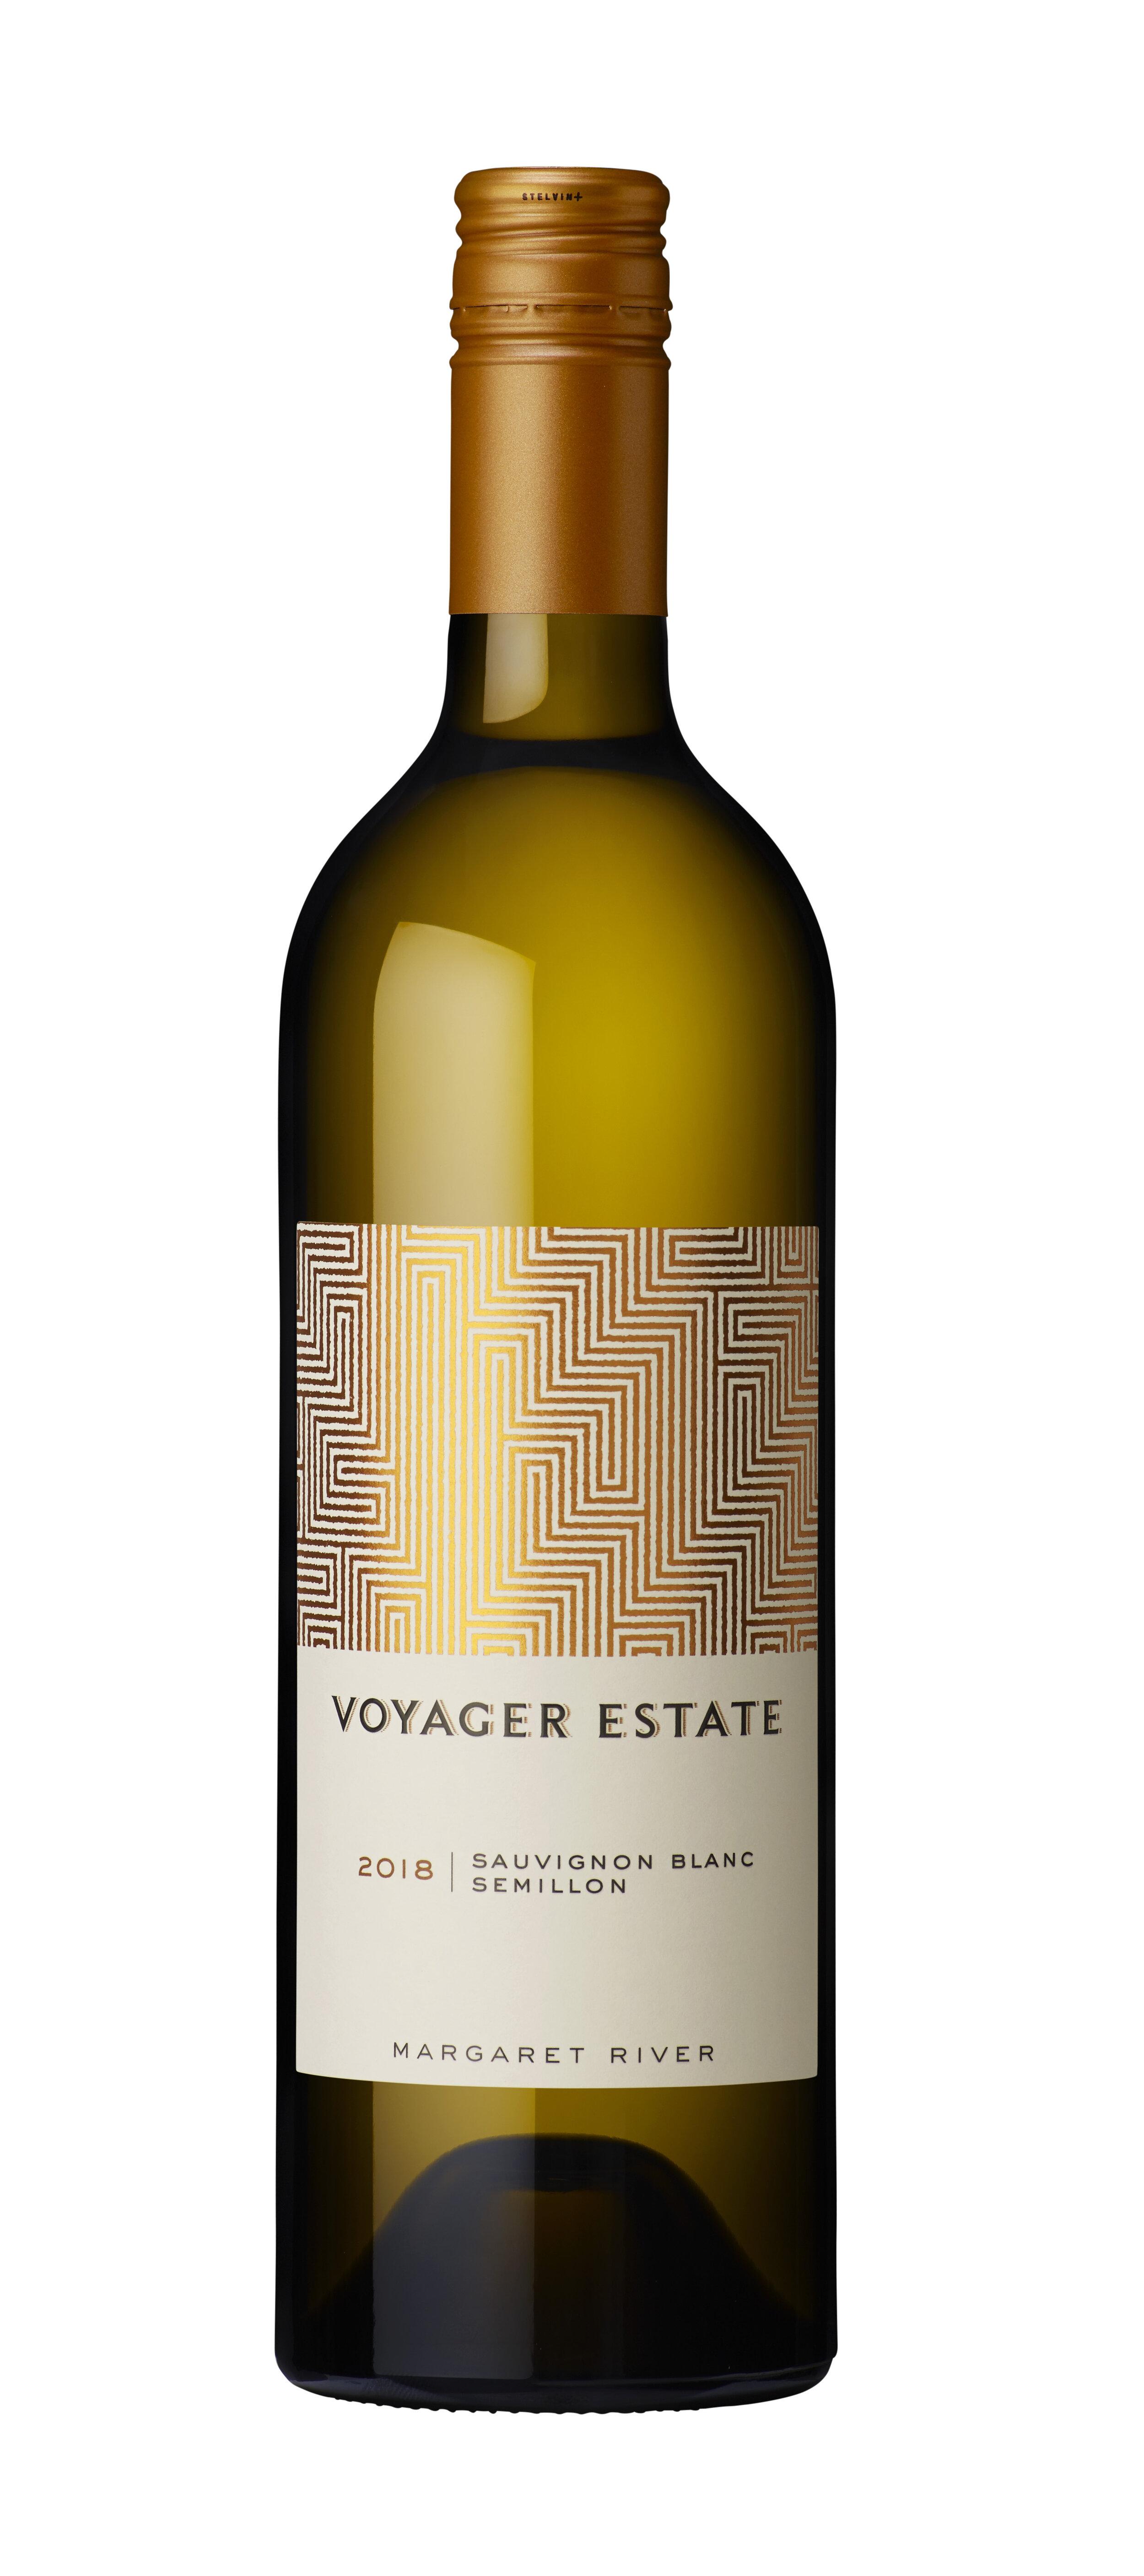 Voyager Estate Sauvignon Blanc Semillion